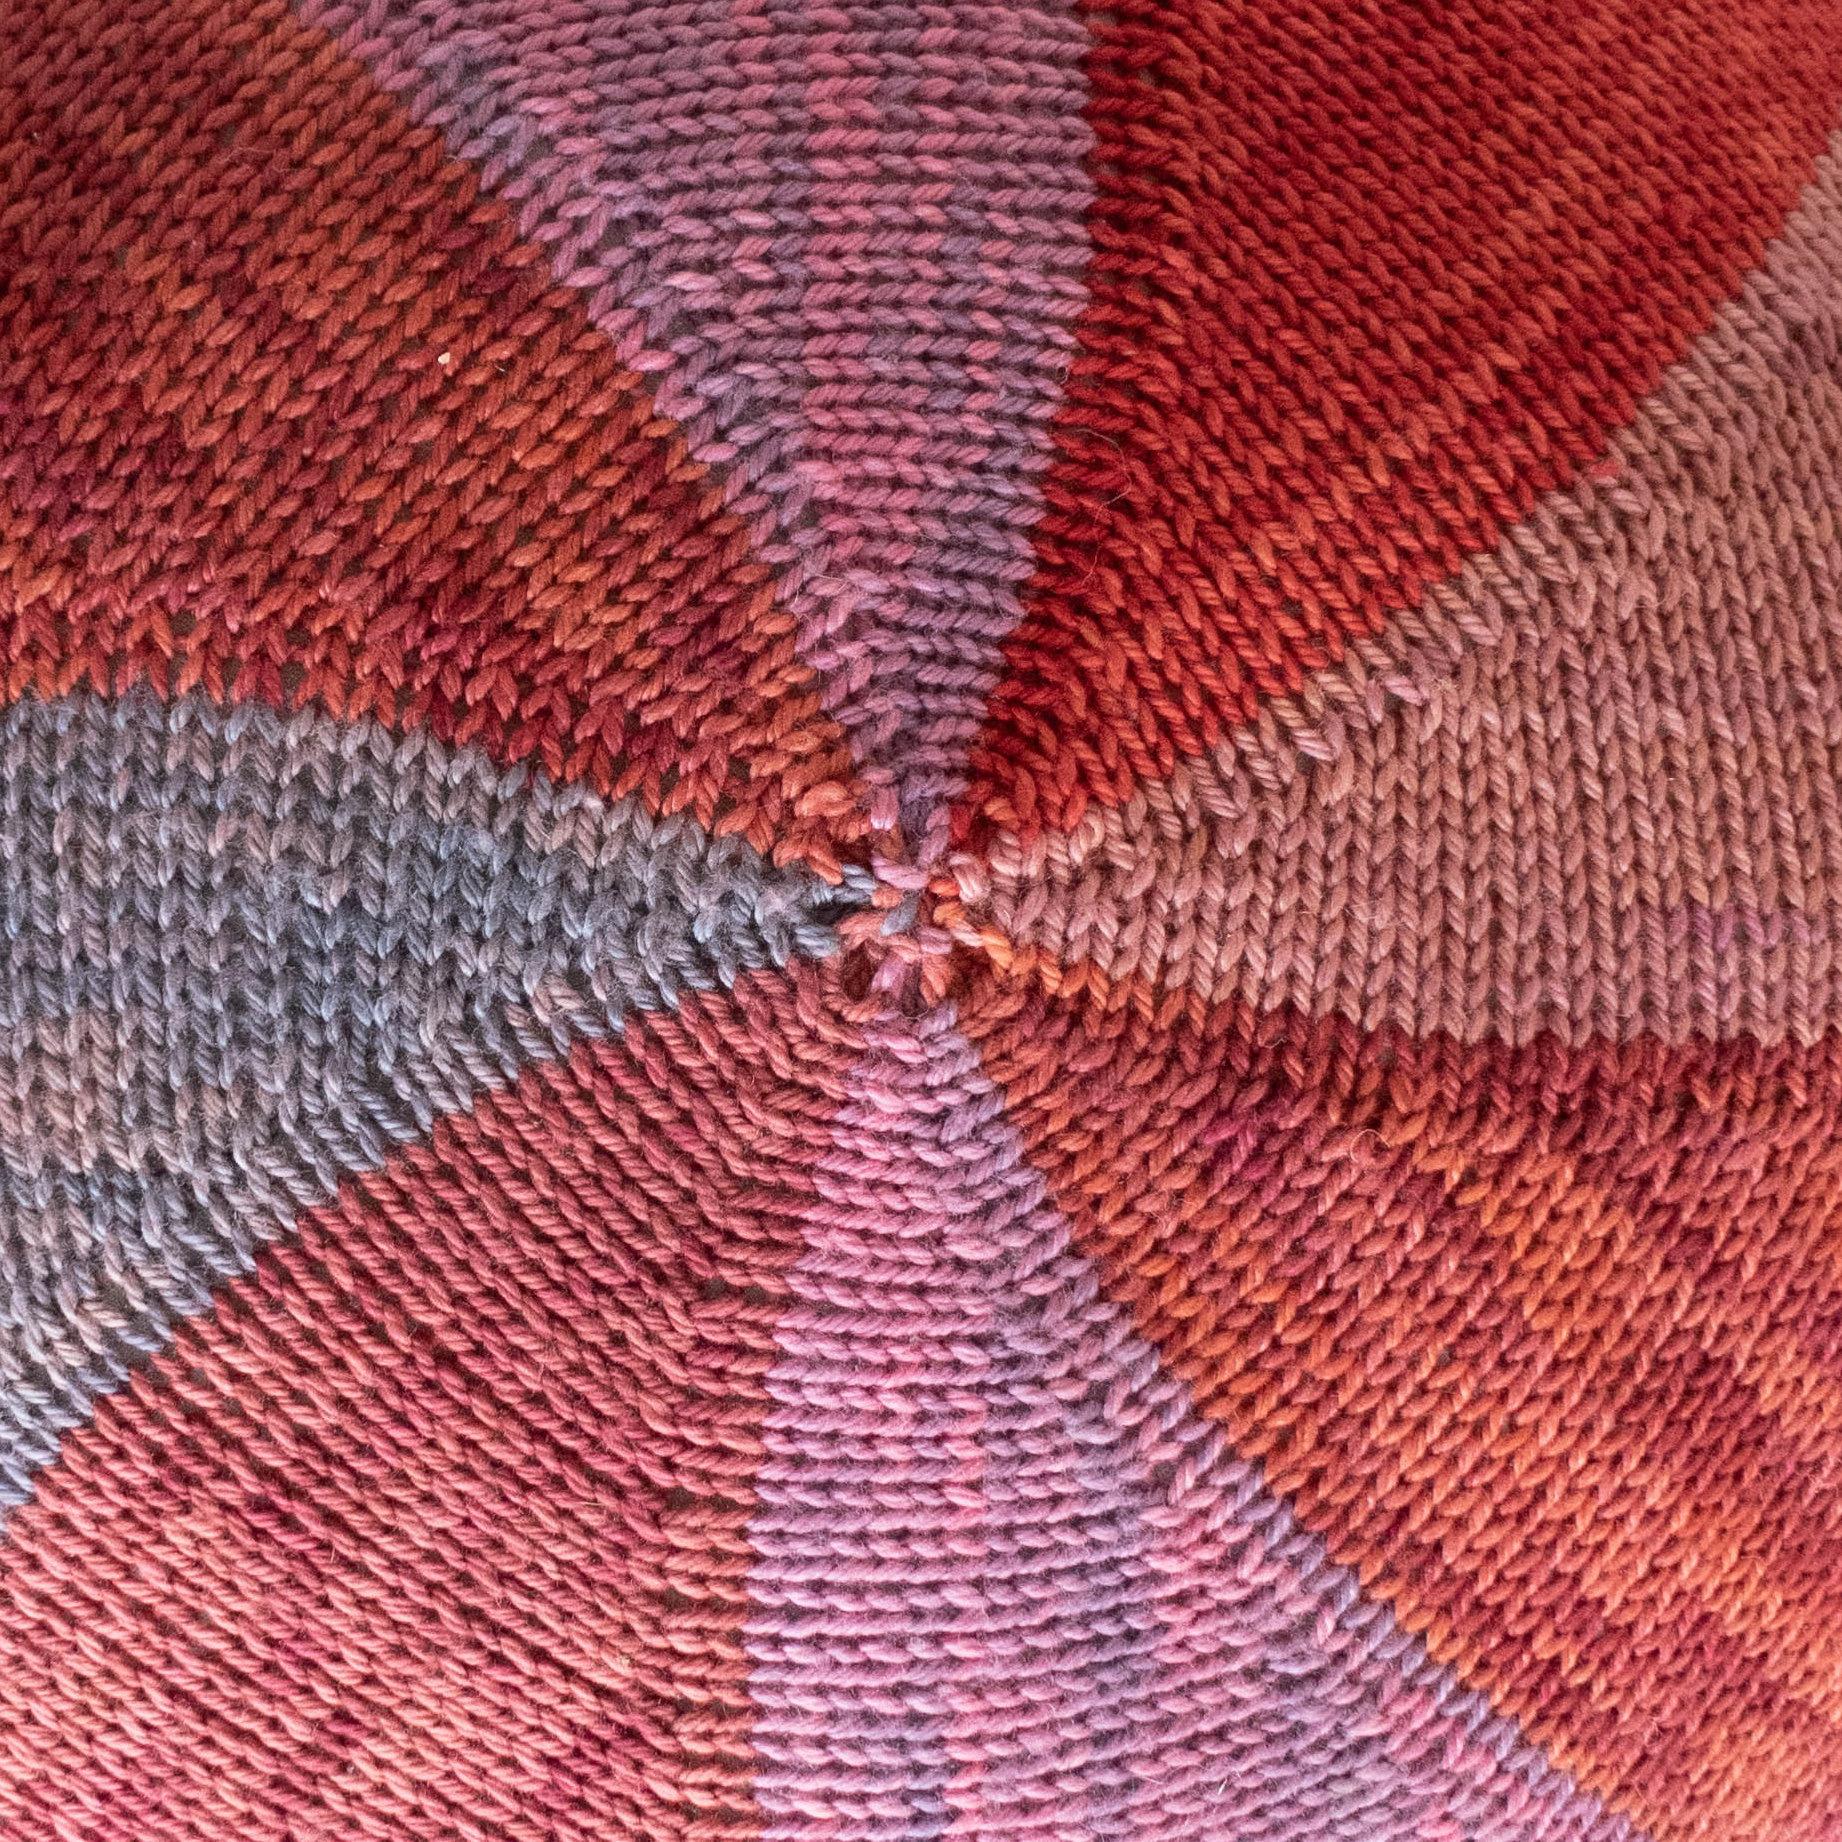 Beyond the Basics: Colourwheel Cushion - Online via Zoom